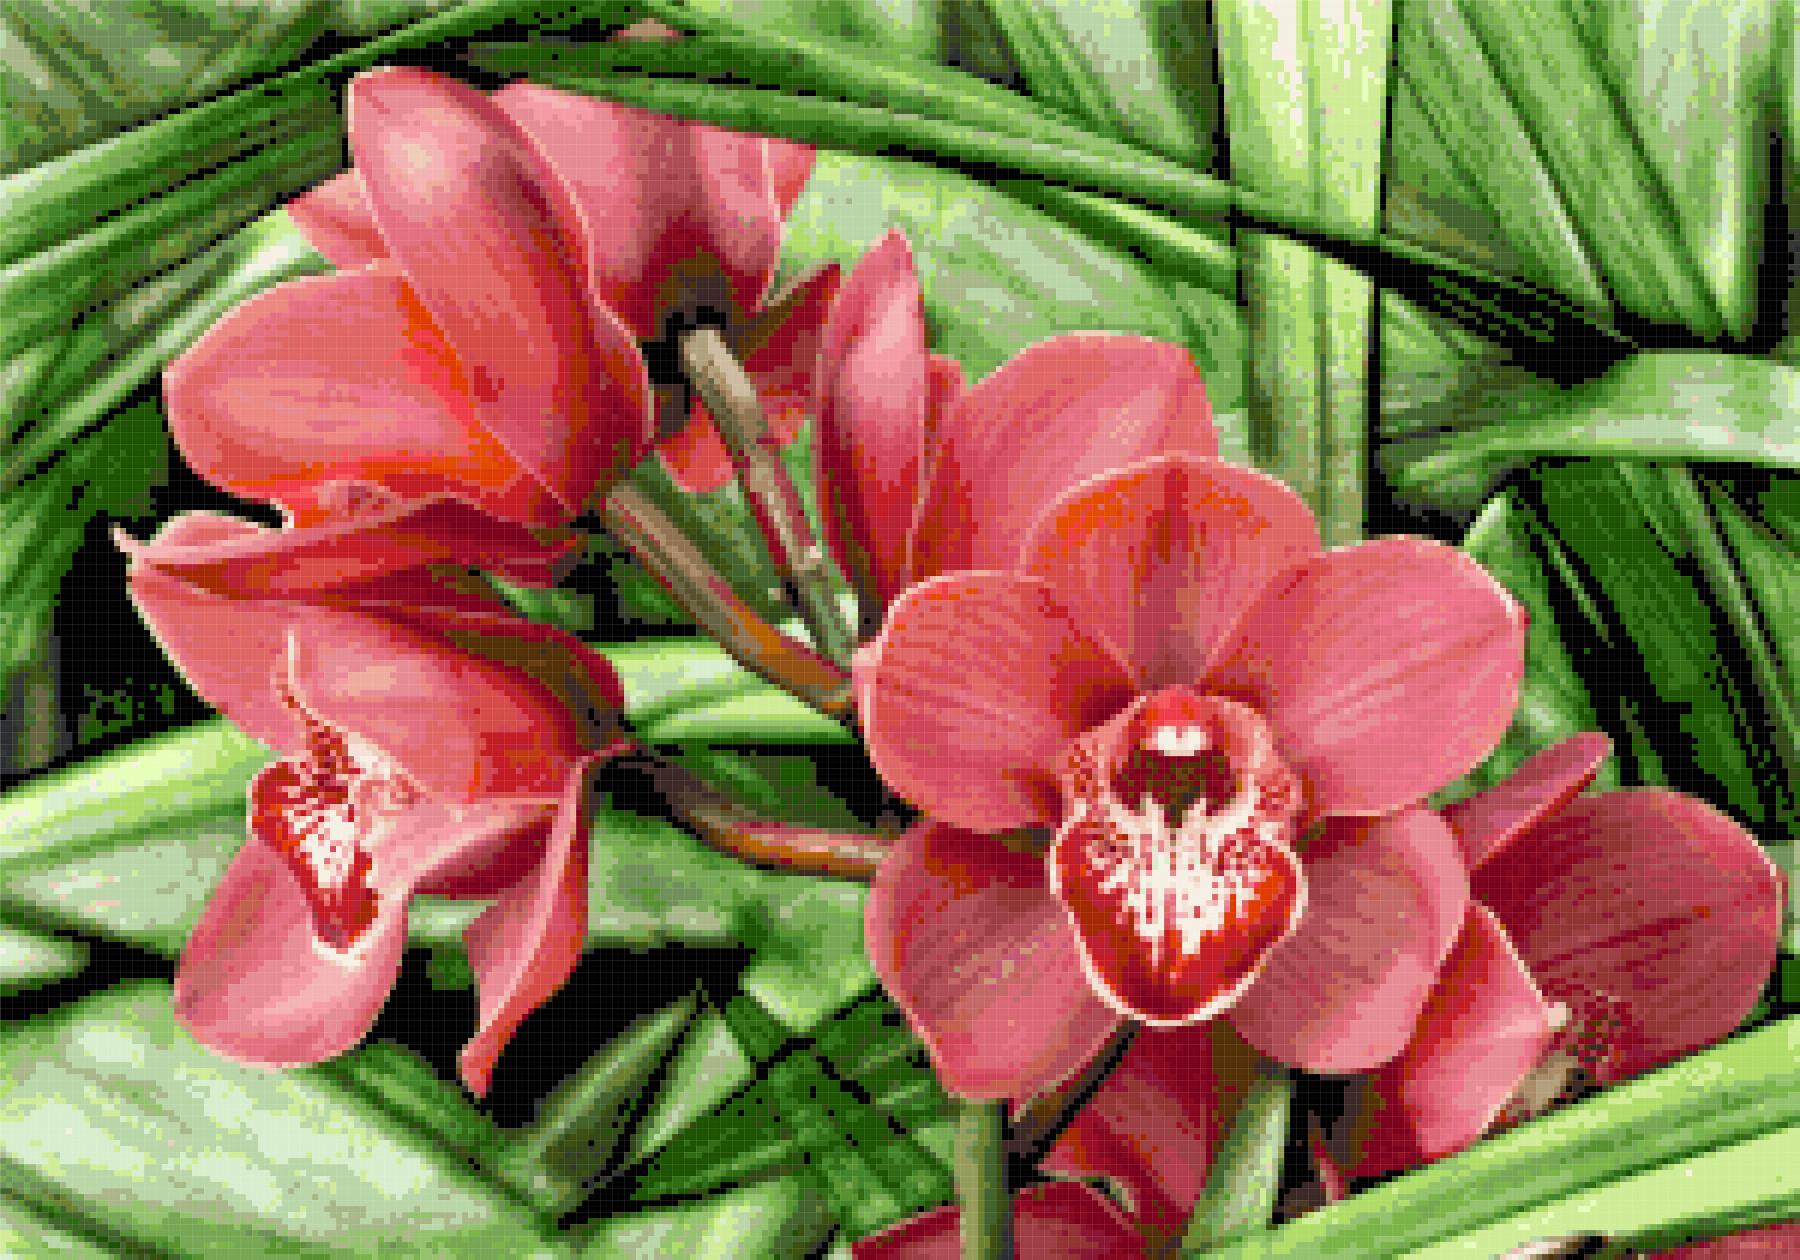 orchid cross stitch image